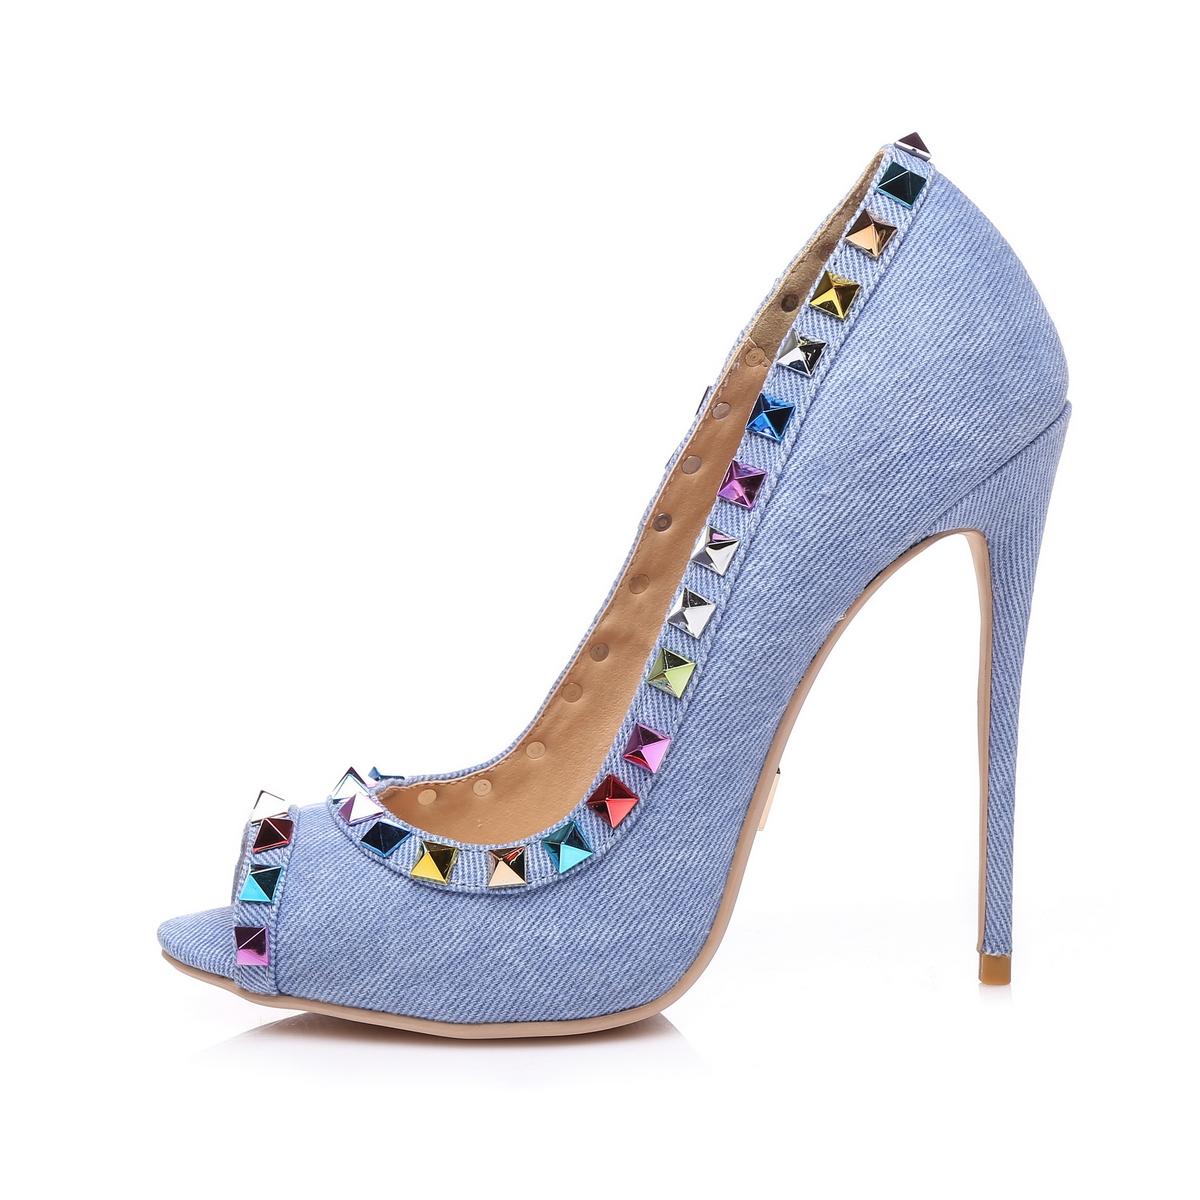 giaro damen high heels blau schuhe in bergr en ebay. Black Bedroom Furniture Sets. Home Design Ideas